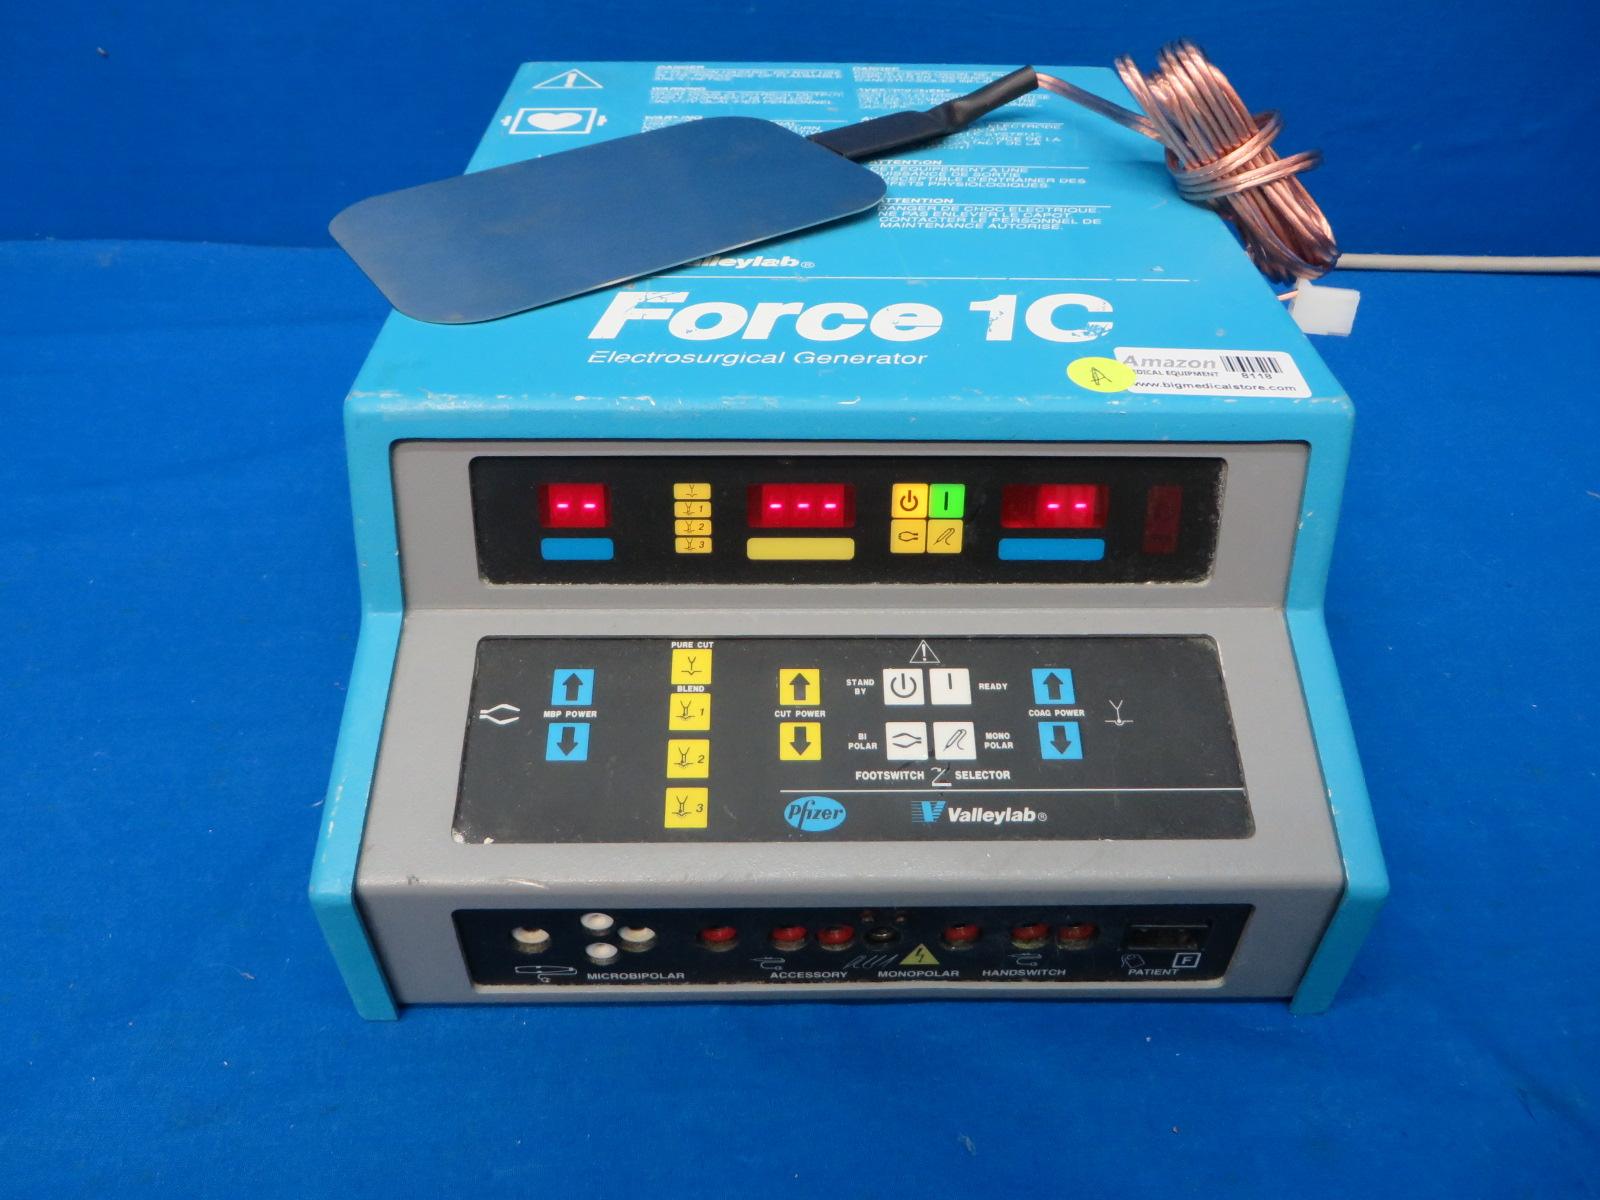 Valleylab Force 1c Electrosurgical Generator Esu With